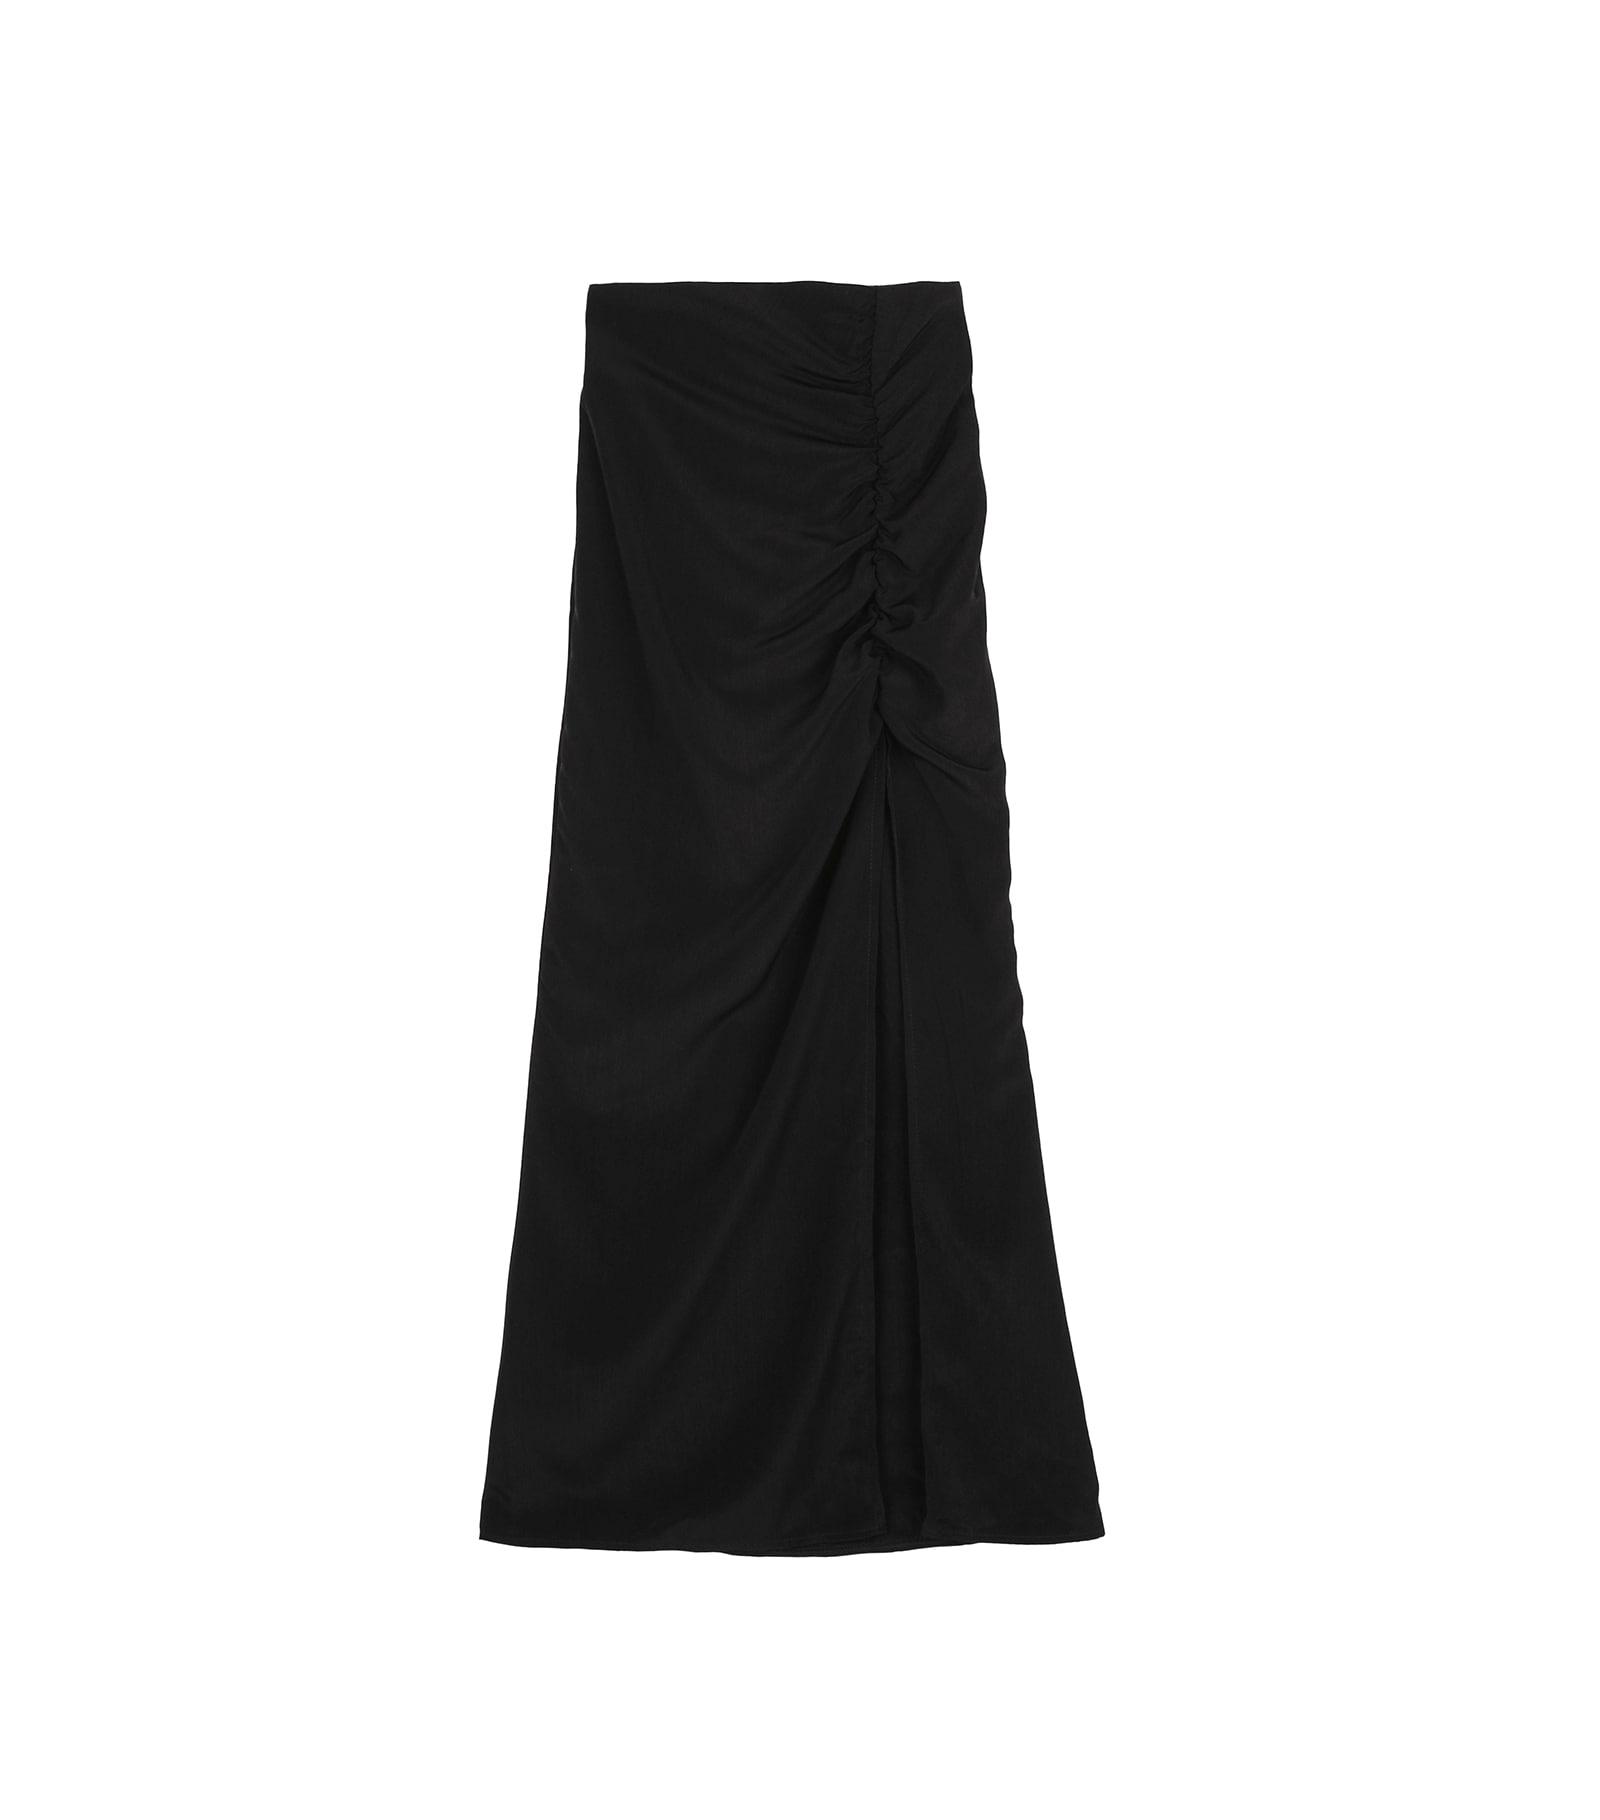 Diva shirred maxi skirt